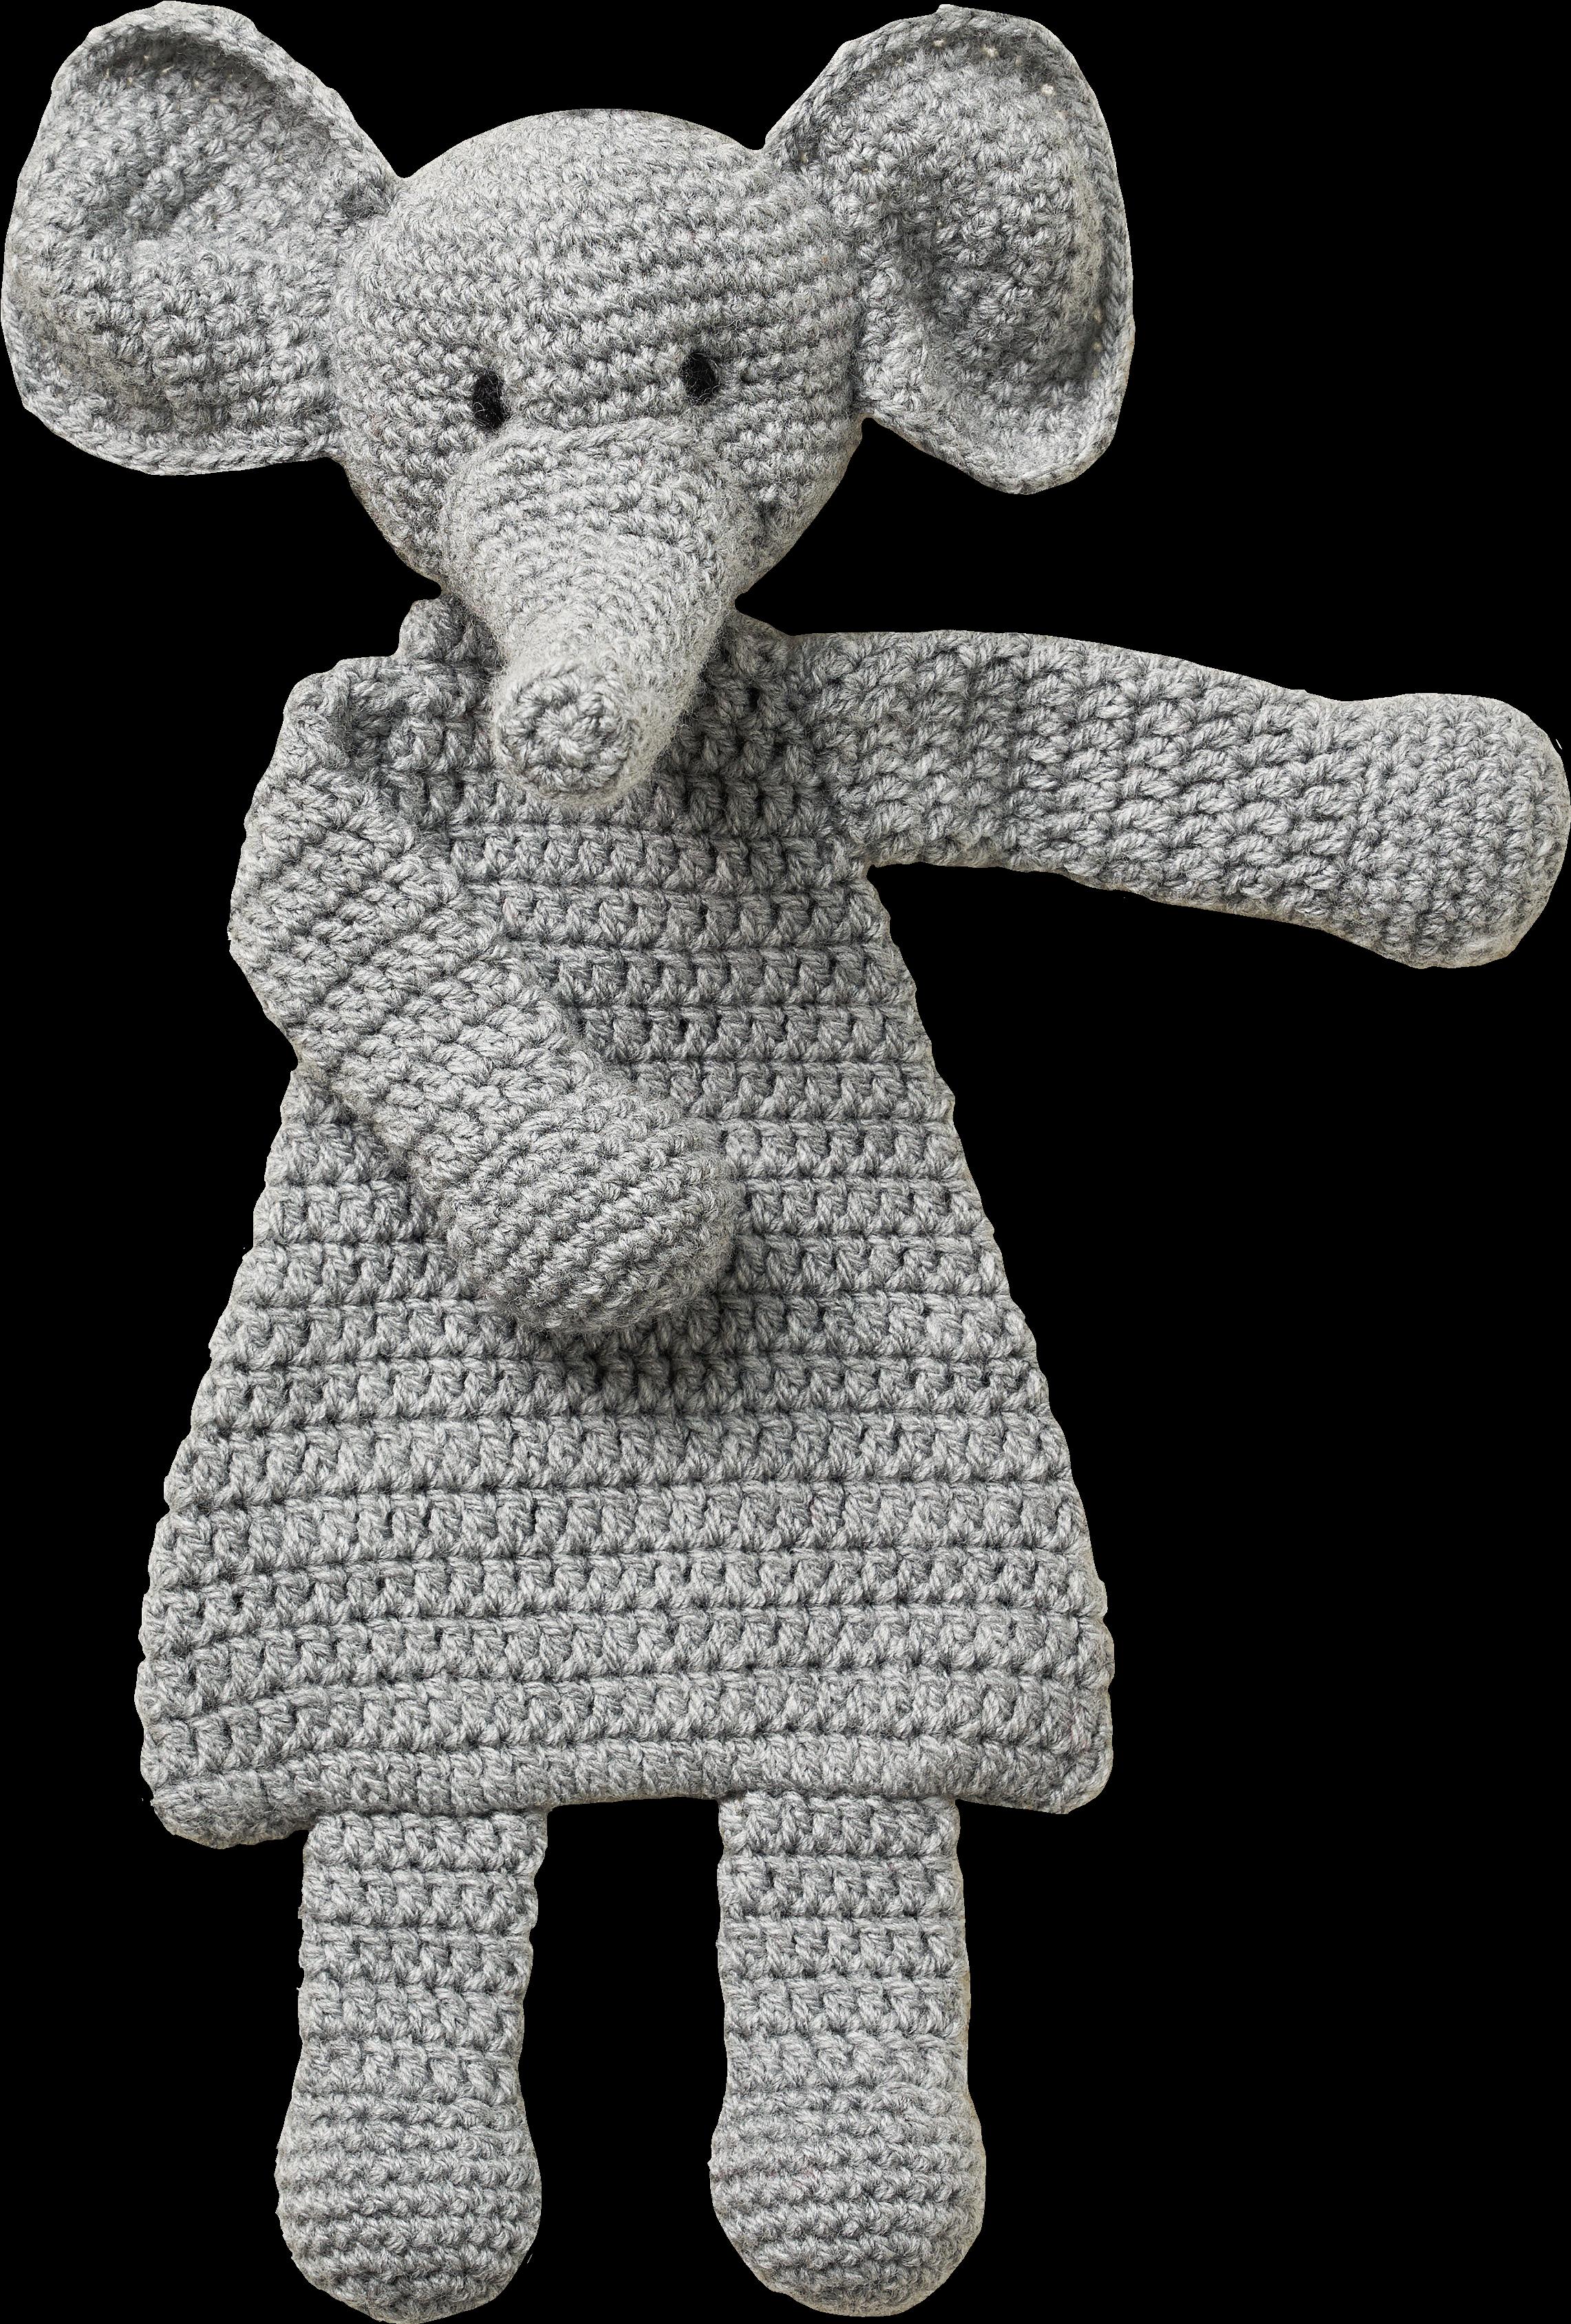 Adorable Crochet Elephant Applique Free Pattern - Knit And Crochet ...   3377x2283